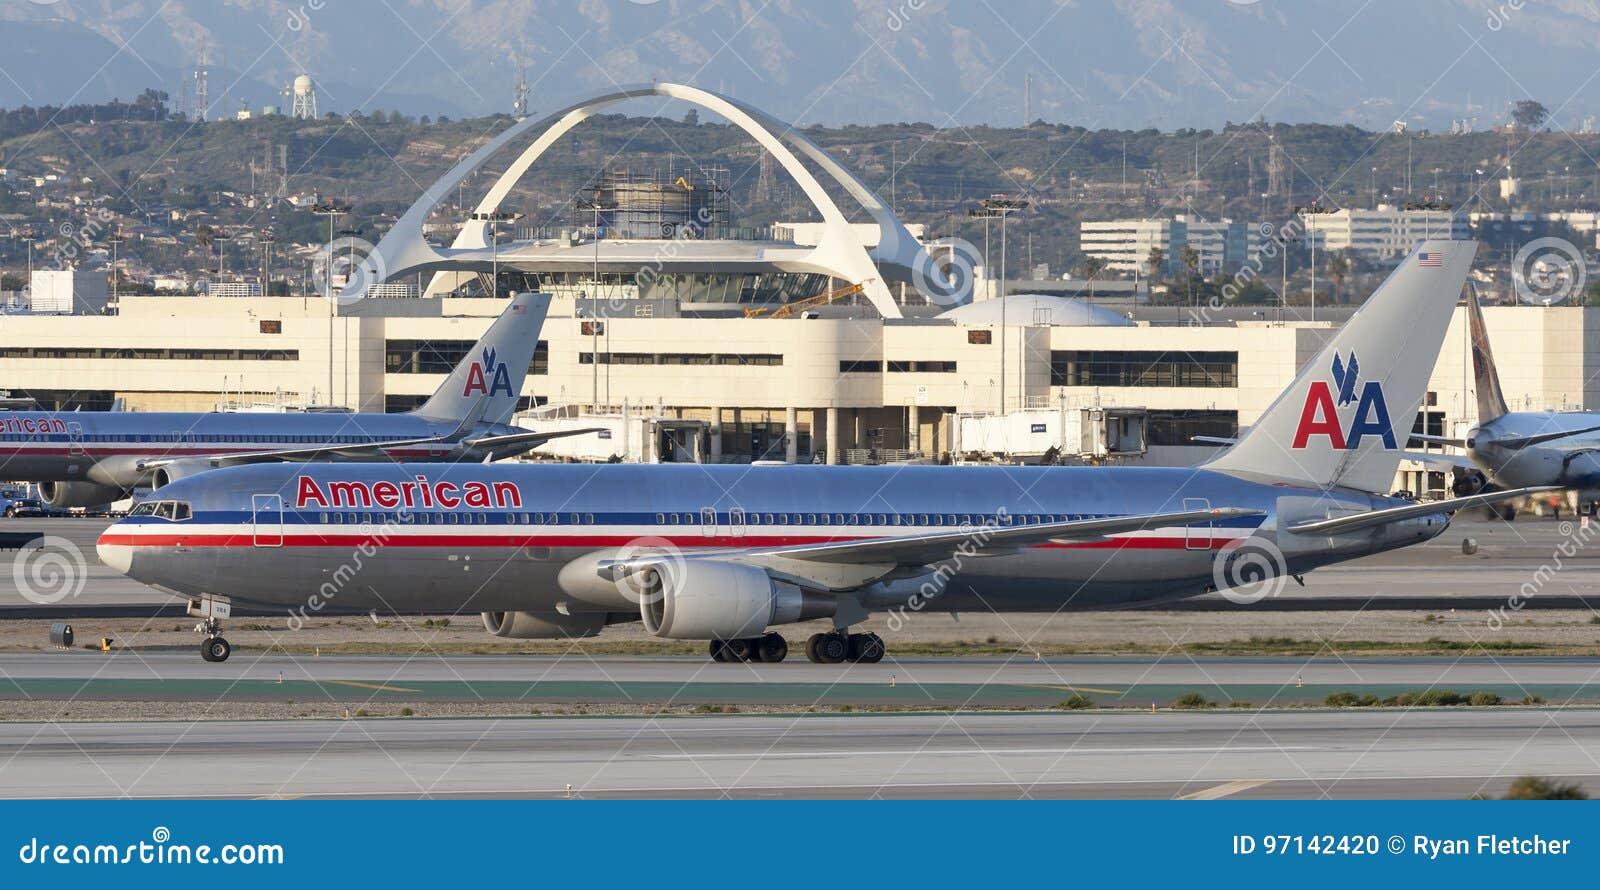 American Airlines Boeing 767 Airliner At Los Angeles International